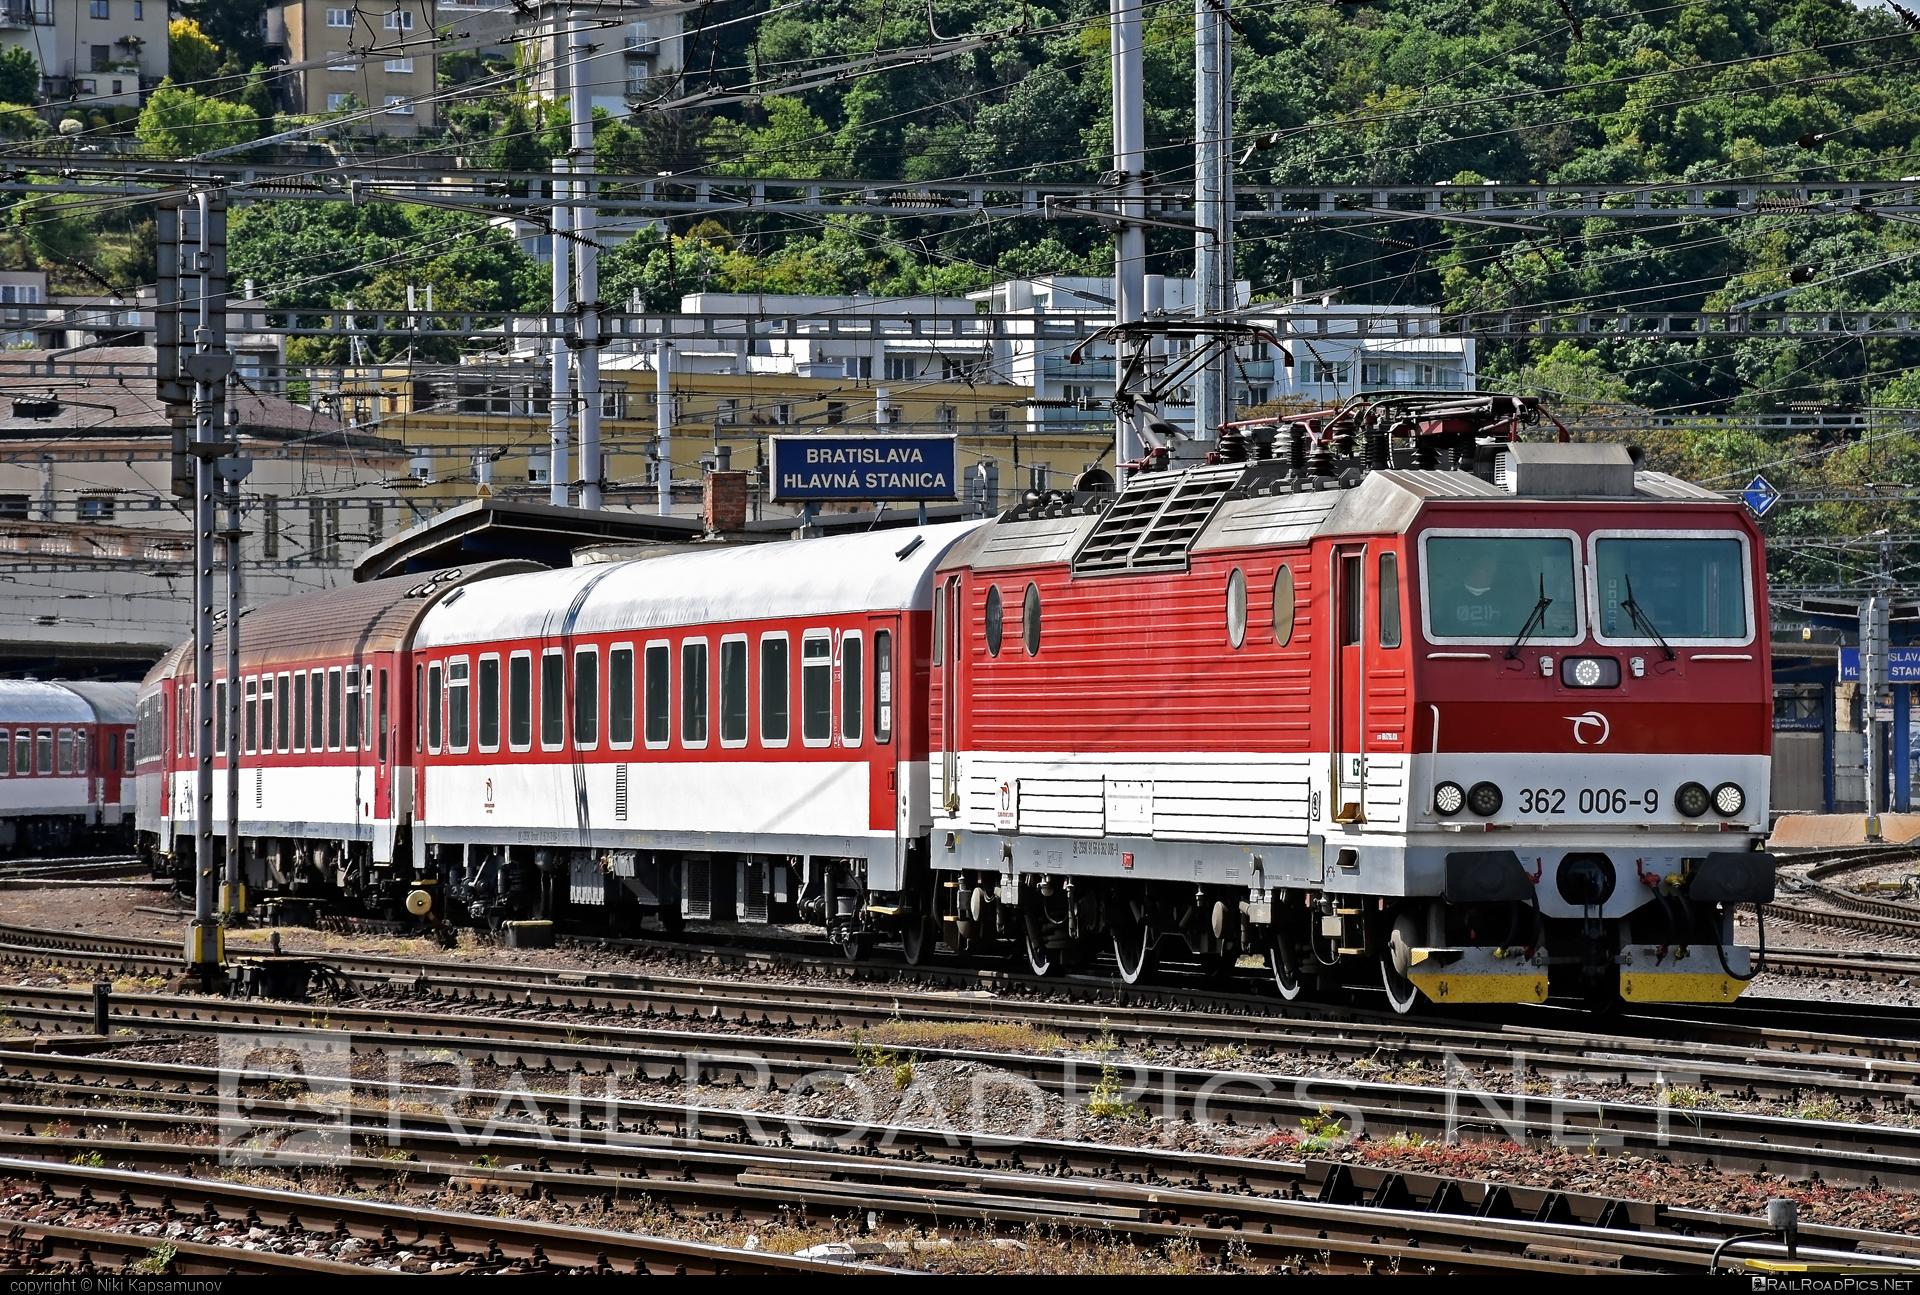 Škoda 69Er - 362 006-9 operated by Železničná Spoločnost' Slovensko, a.s. #ZeleznicnaSpolocnostSlovensko #eso #locomotive362 #rychleeso #skoda #skoda69er #zssk